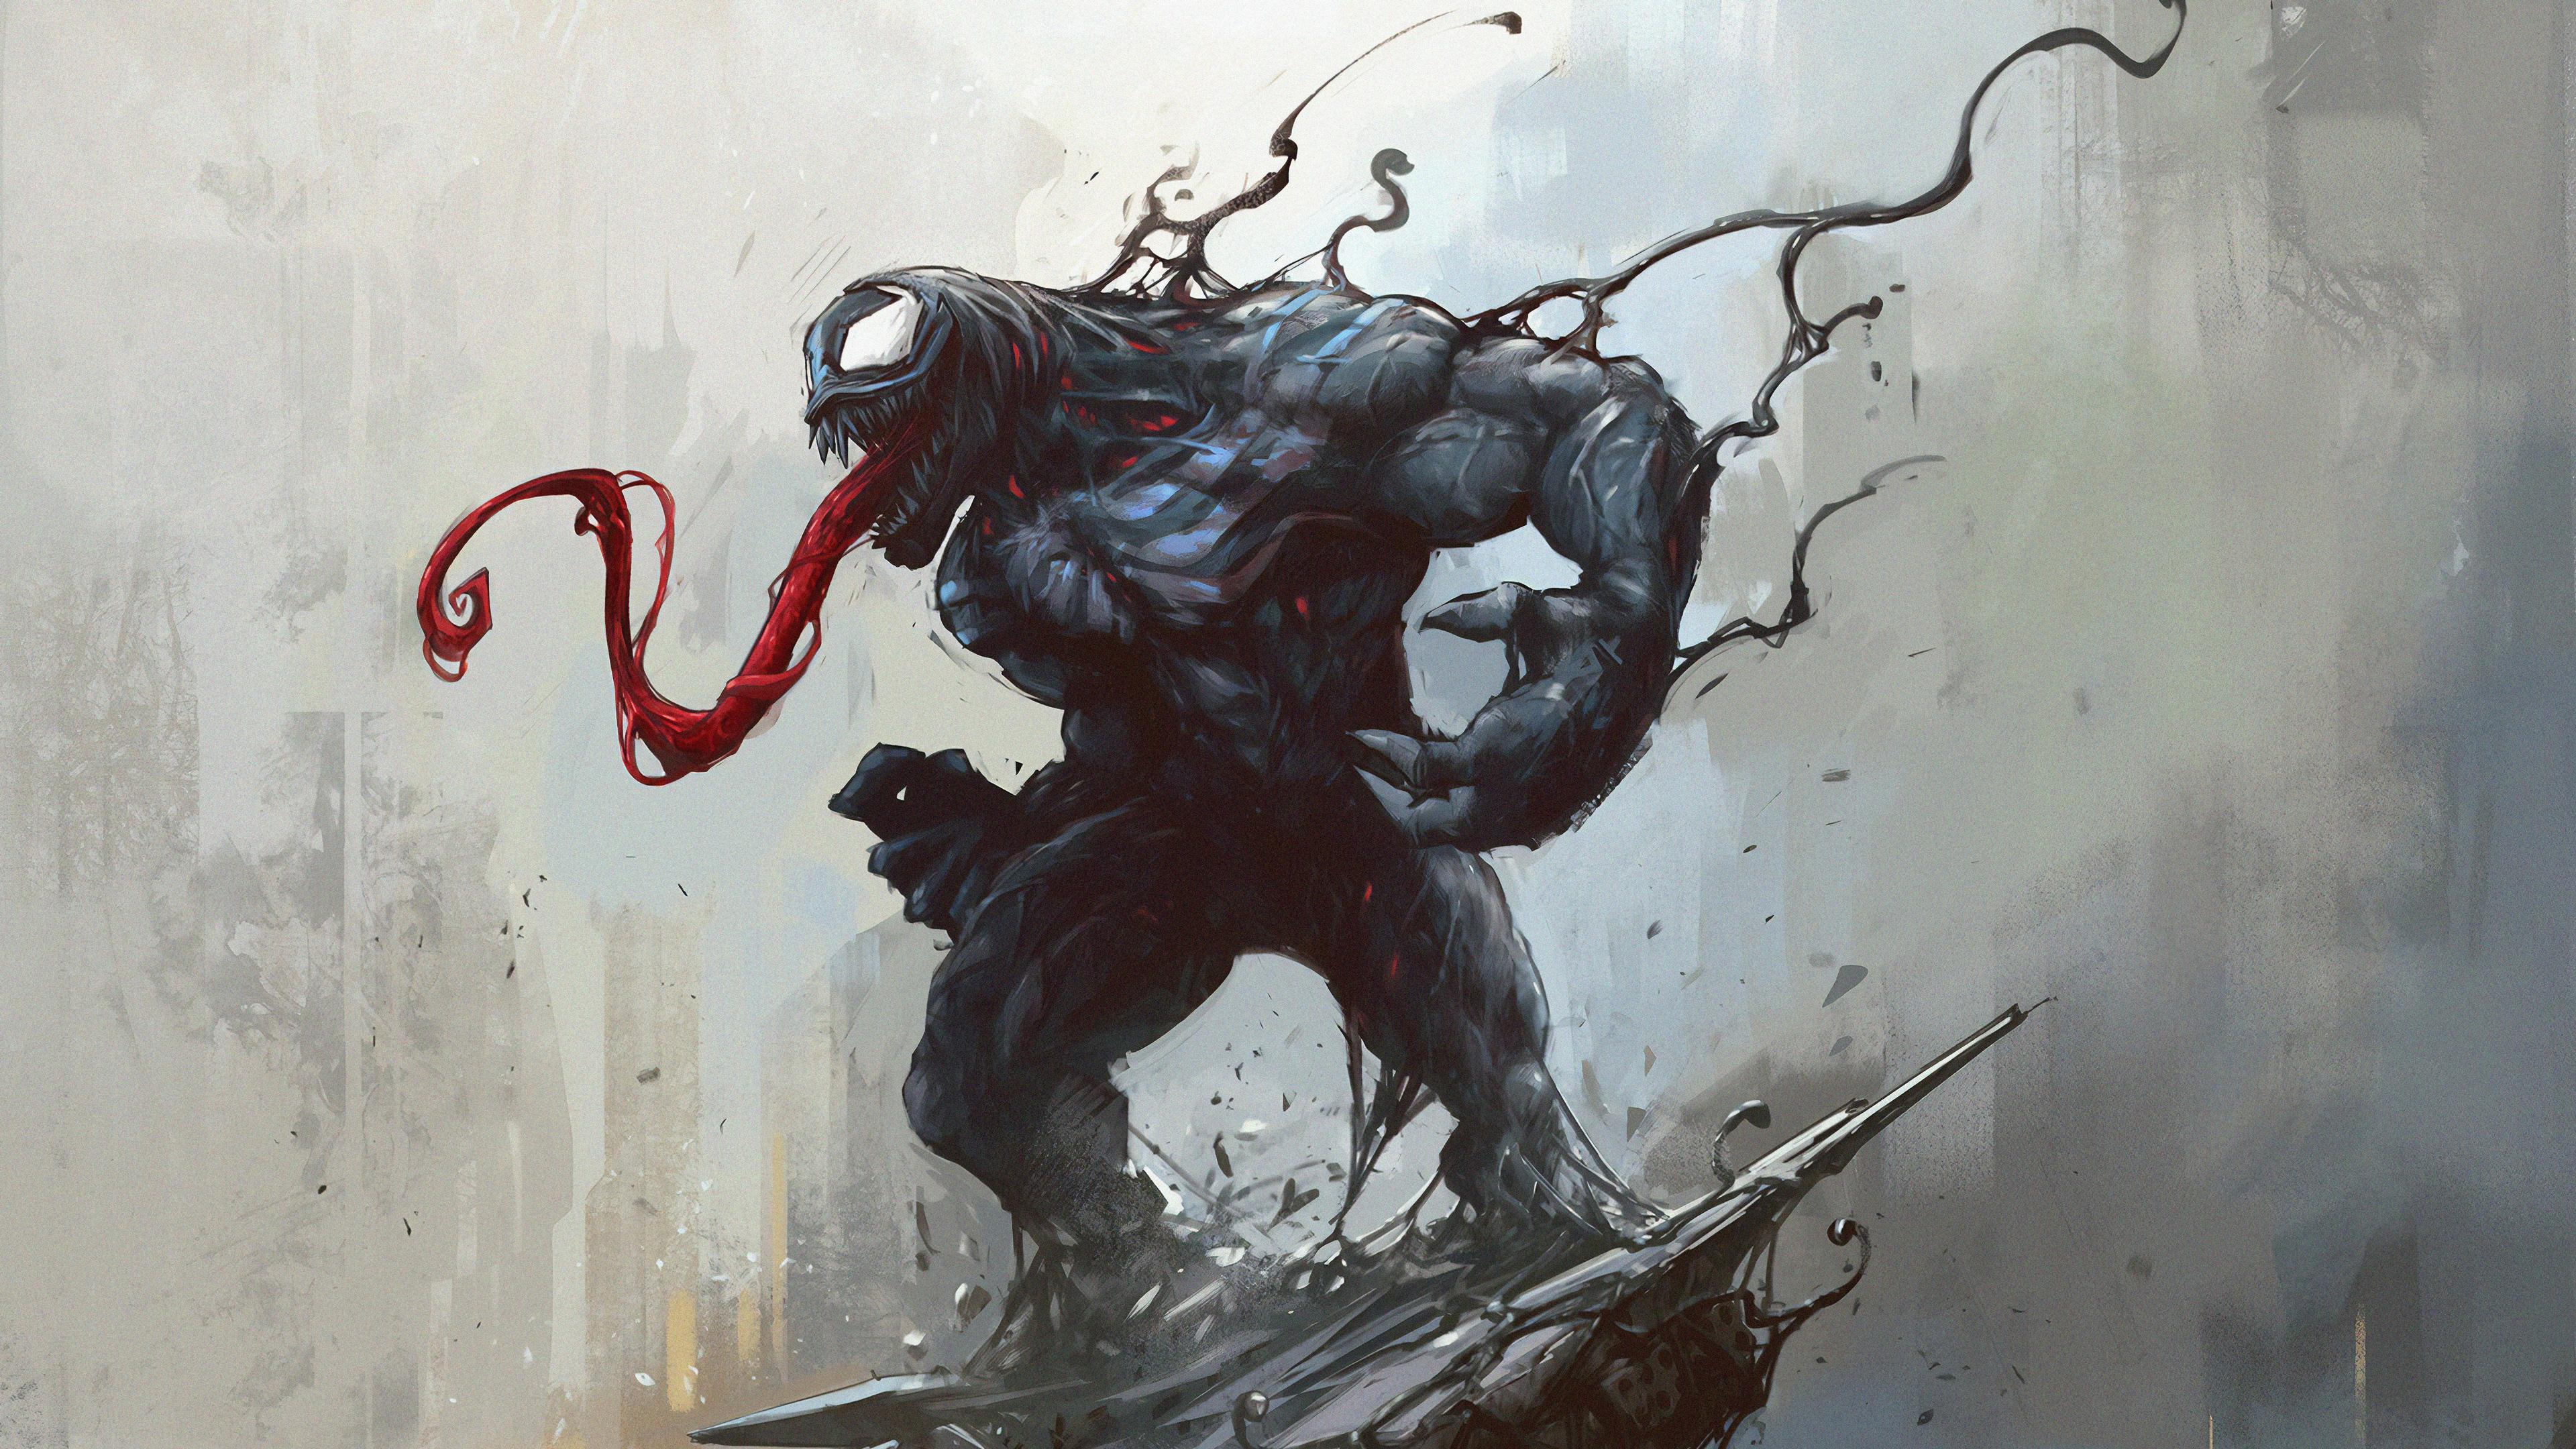 venom artworks new 1563220276 - Venom Artworks New - Venom wallpapers, supervillain wallpapers, superheroes wallpapers, hd-wallpapers, 4k-wallpapers